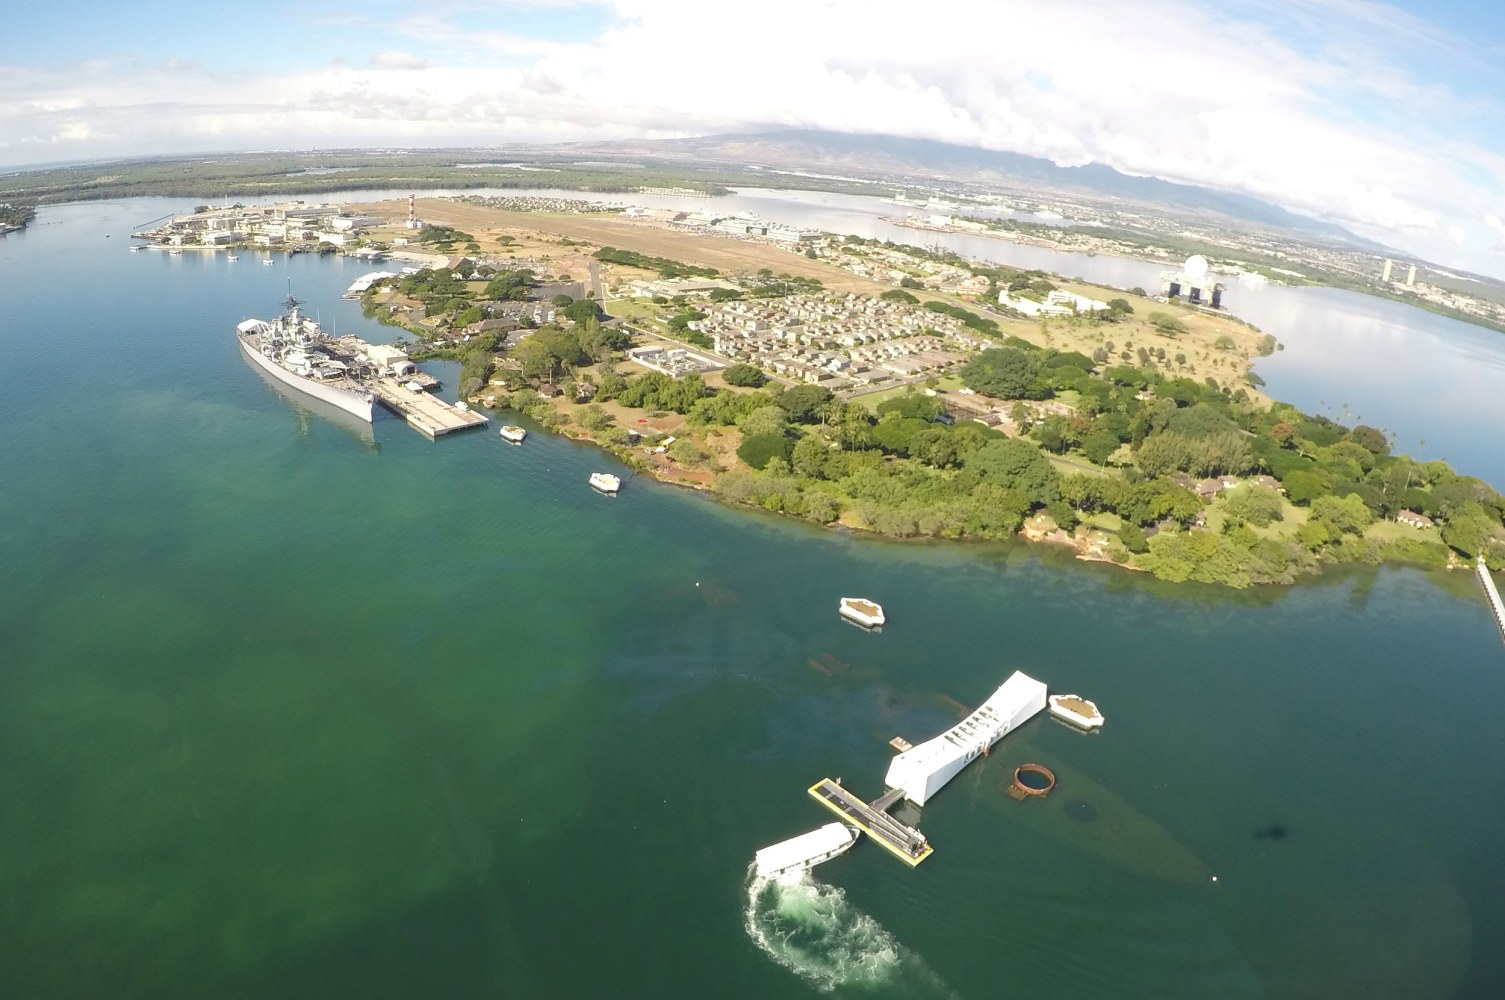 Pearl Harbor  Nation Marks   th Anniversary of Japan     s Attack     Image  The USS Arizona Memorial and USS Battleship Missouri Memorial